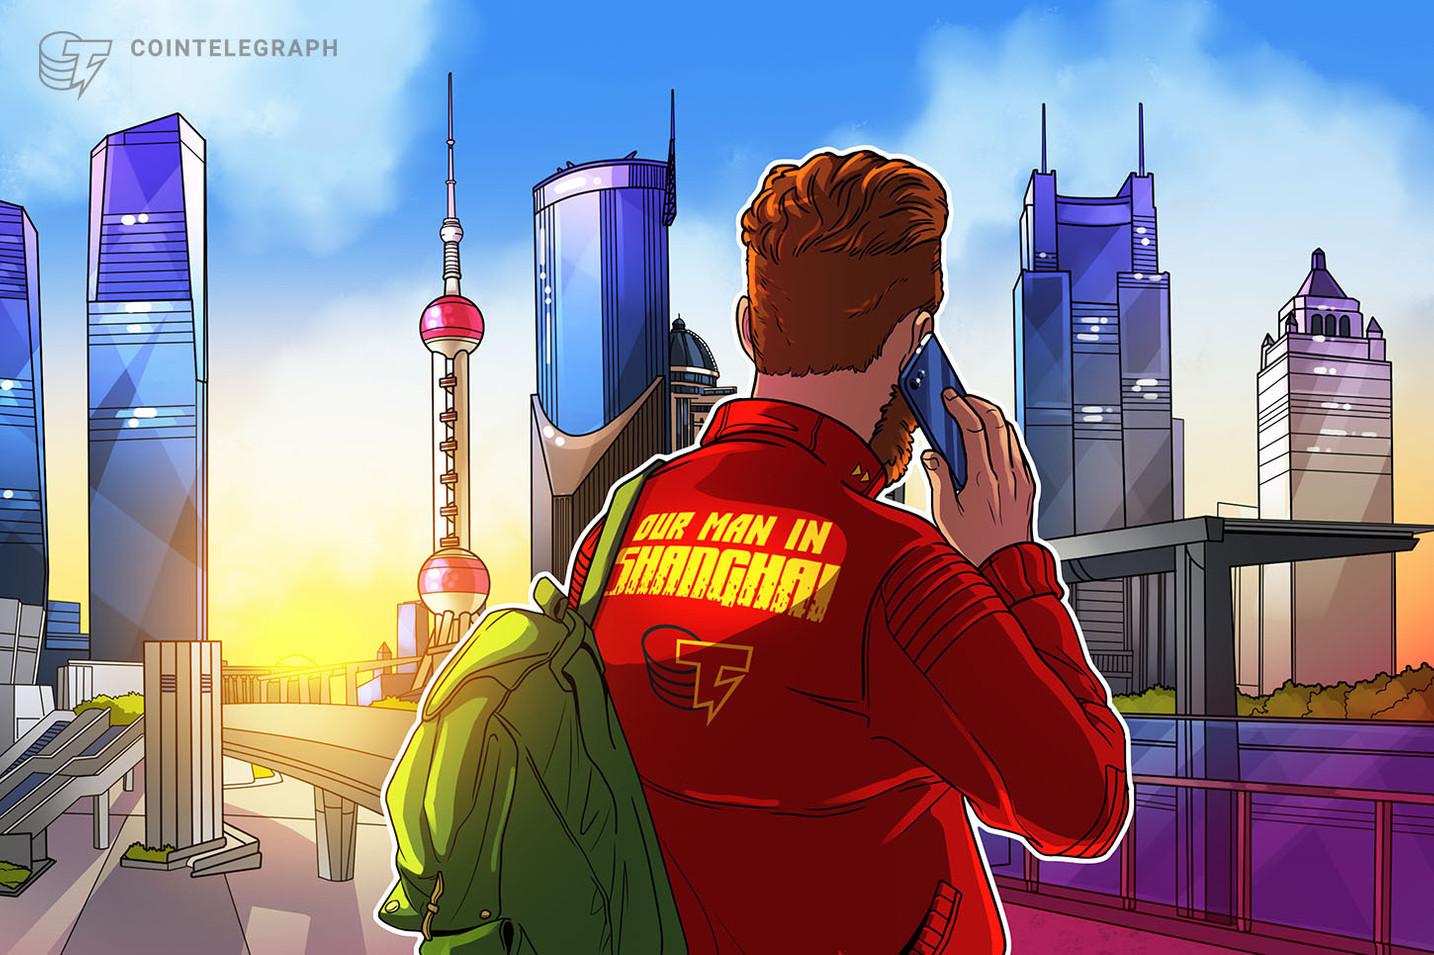 Nosso Homem em Shanghai: VeChain na TV, DOGE ultrapassa volume do BTC, hack na Hotbit e muito mais ...